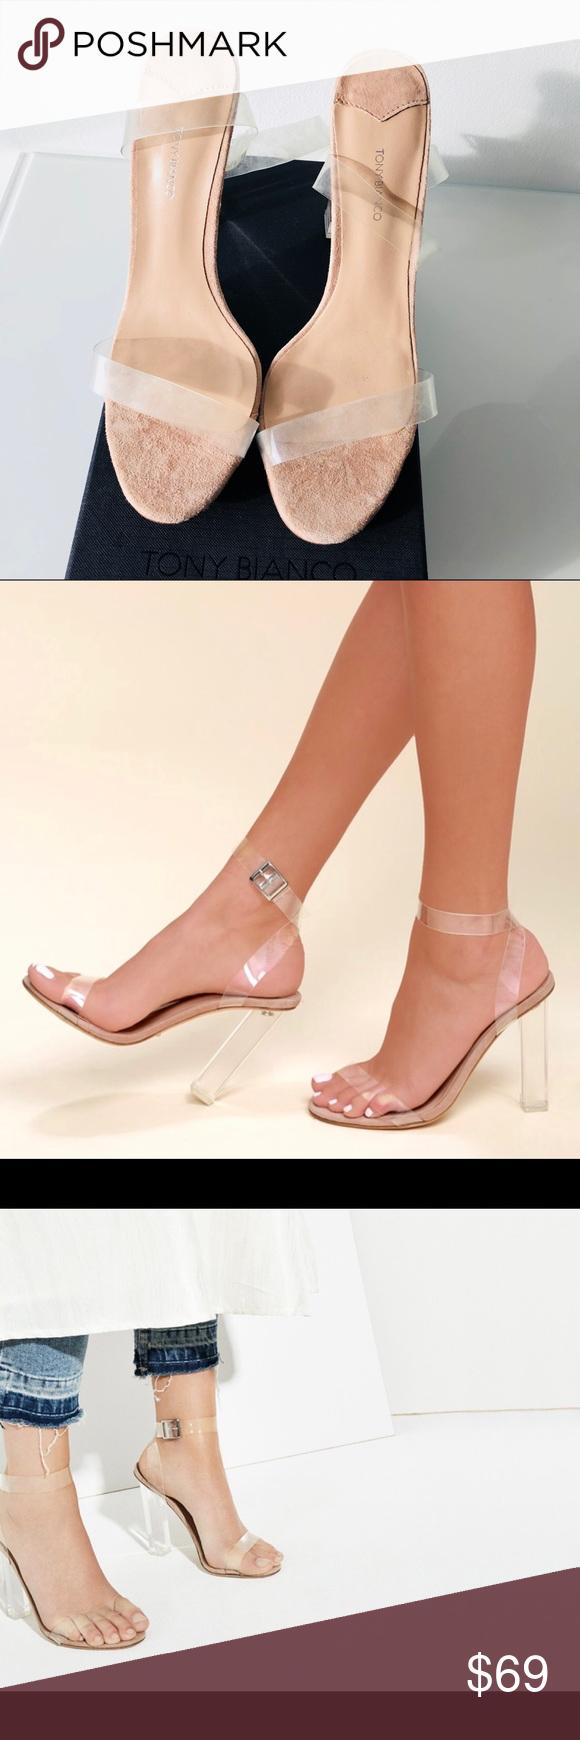 23c2e68461b Tony Bianco KIKI Sandals SZ 39 KIKI do you ❤️ me?! Tony Bianco ...